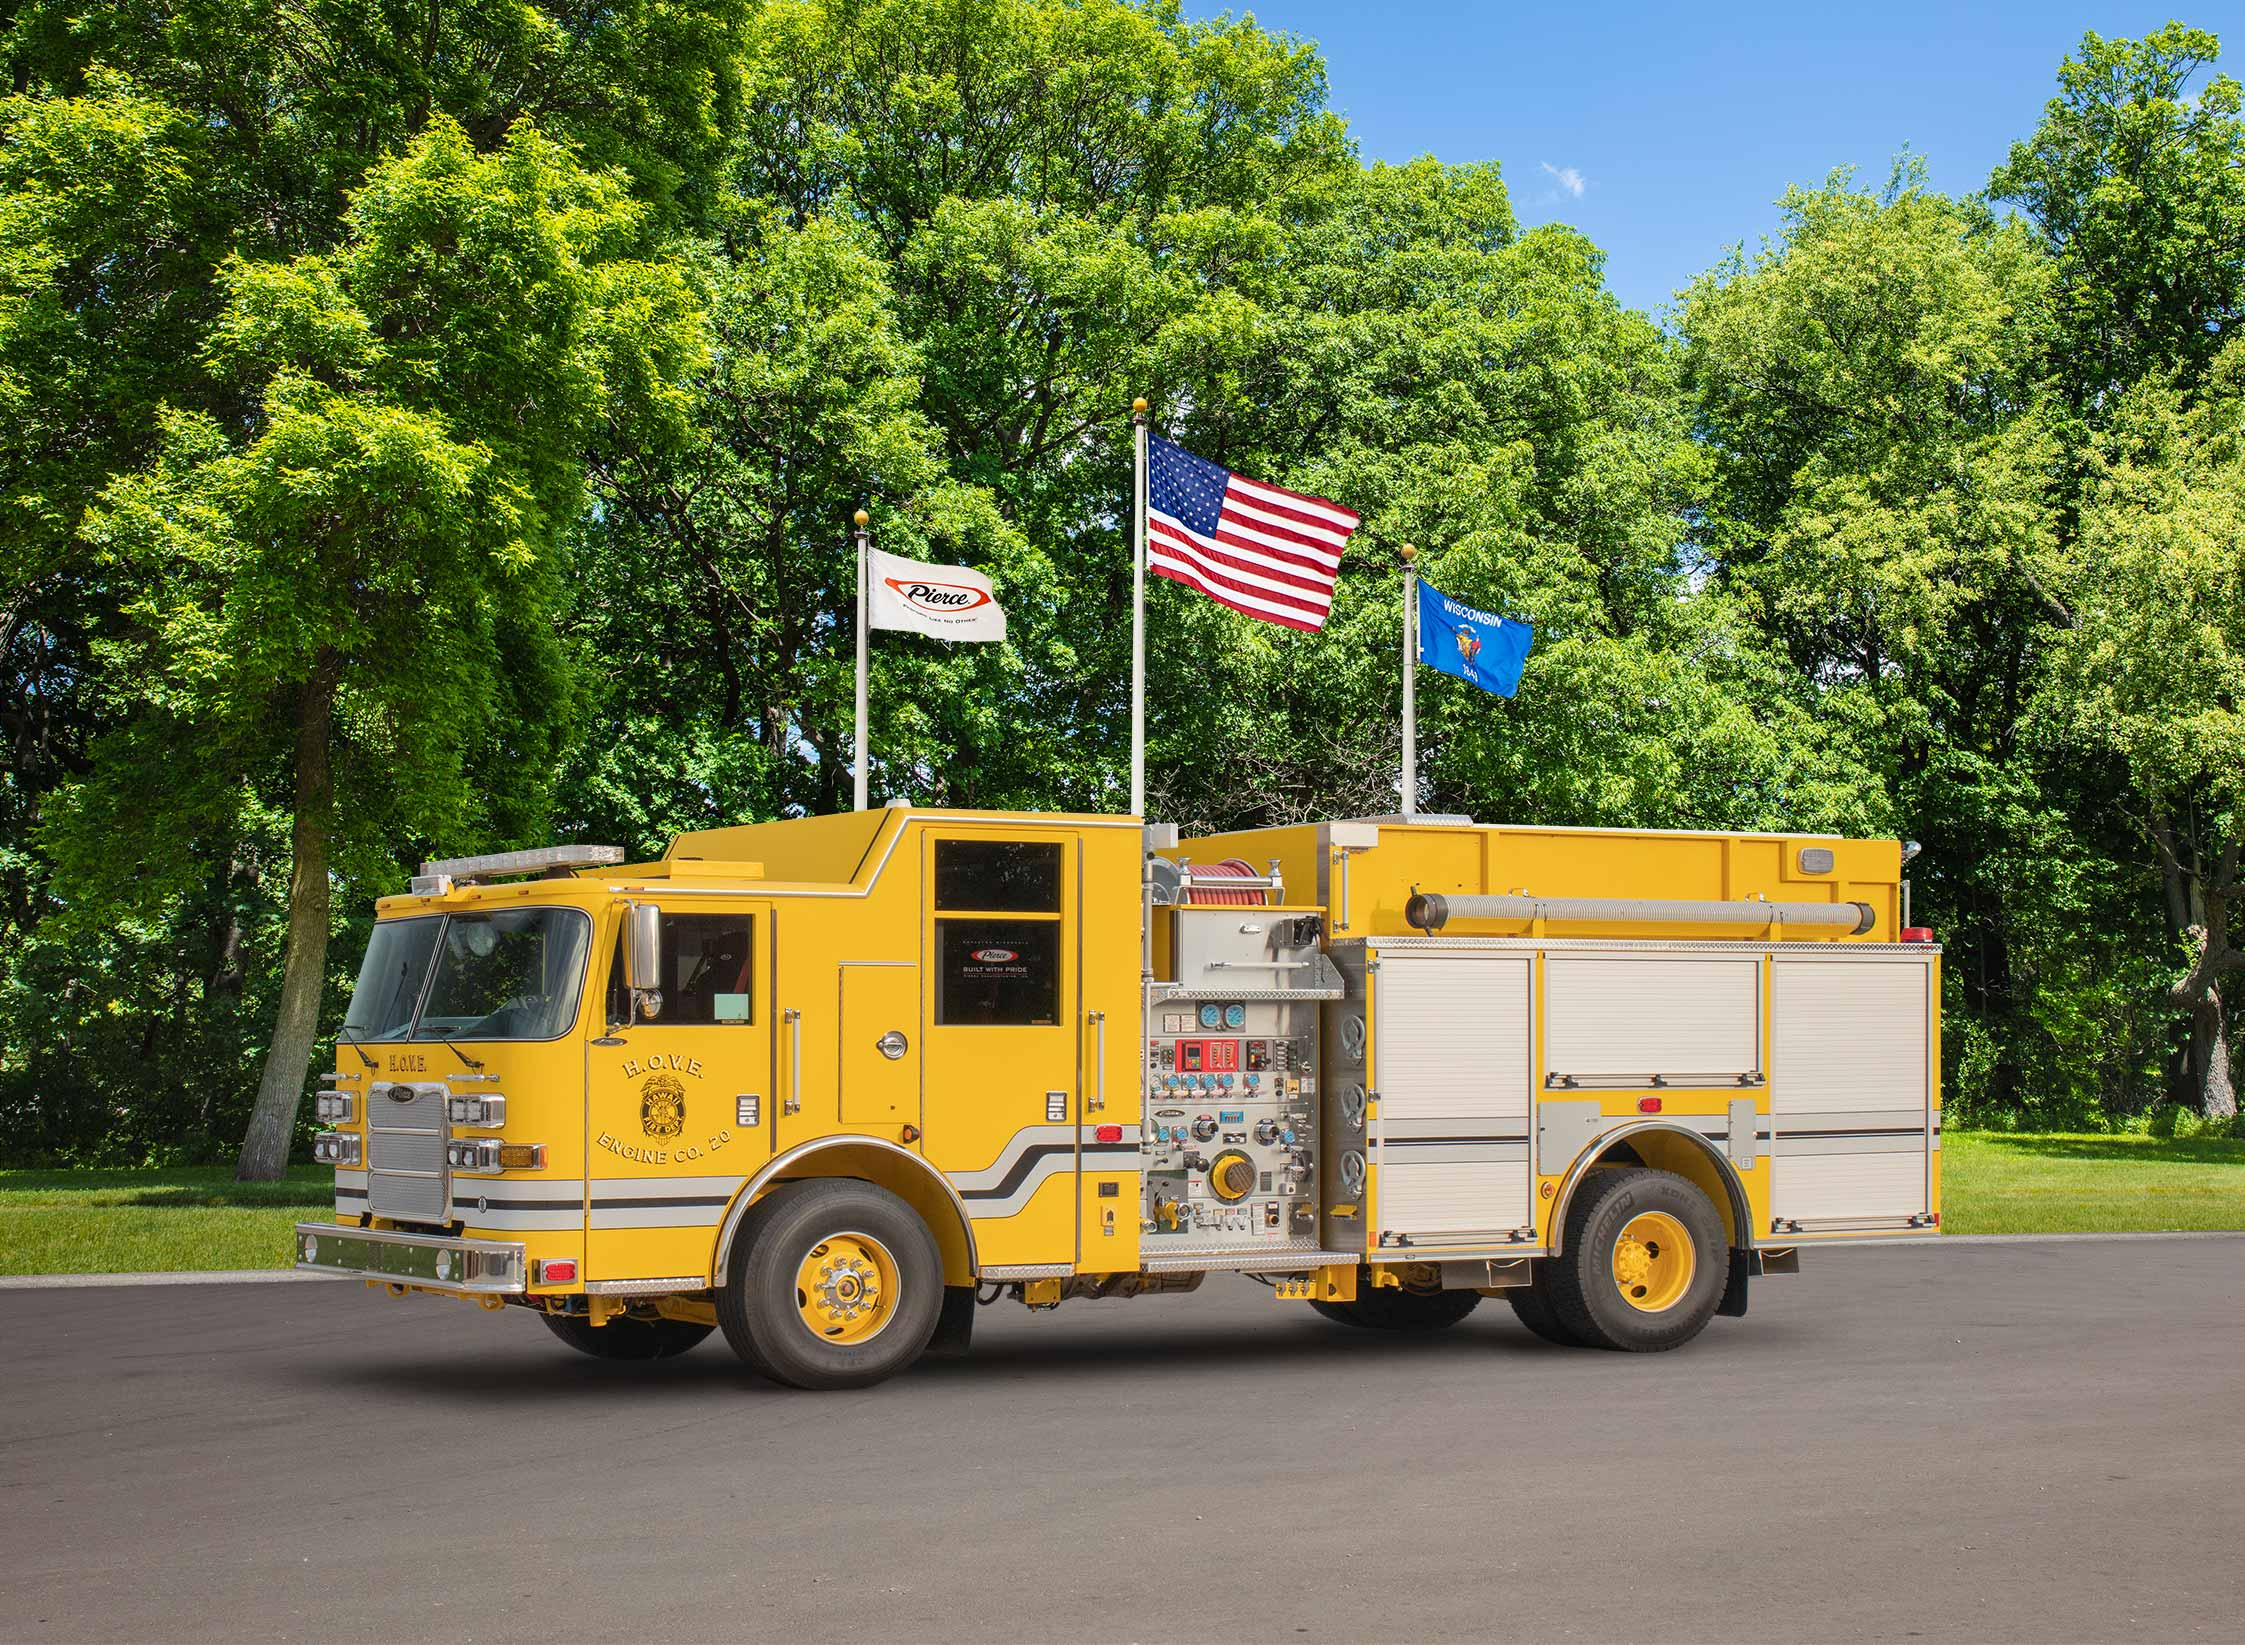 Hawaii County Fire Department - Pumper